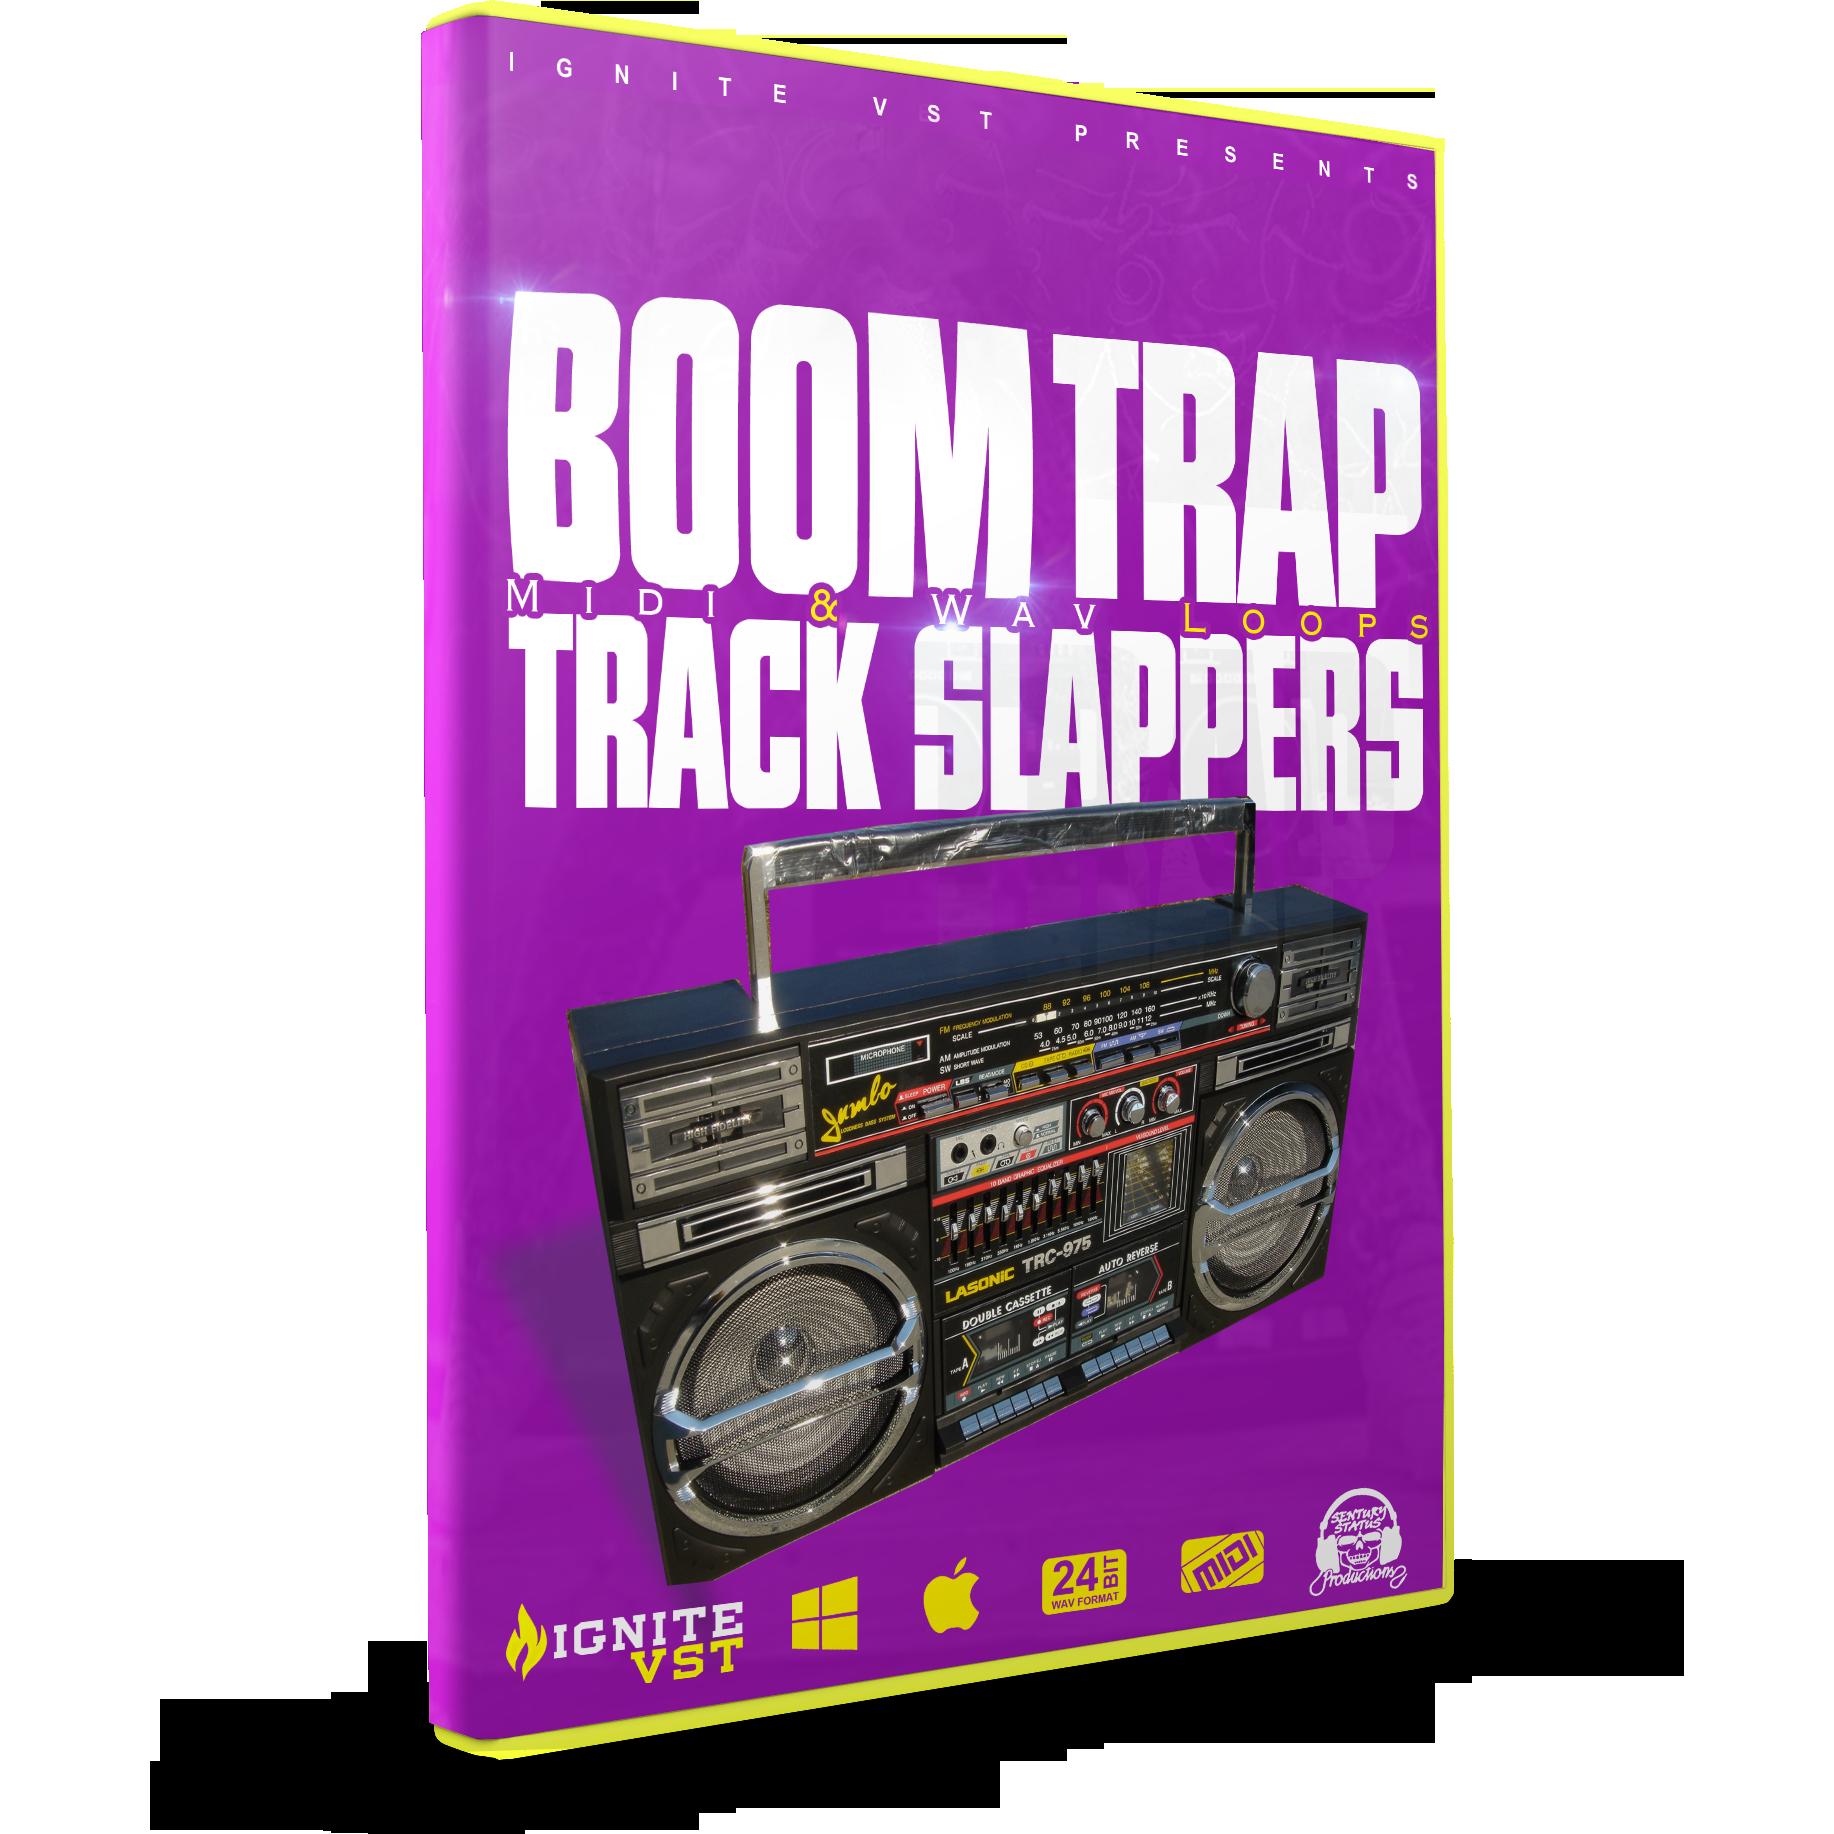 boom bap loops